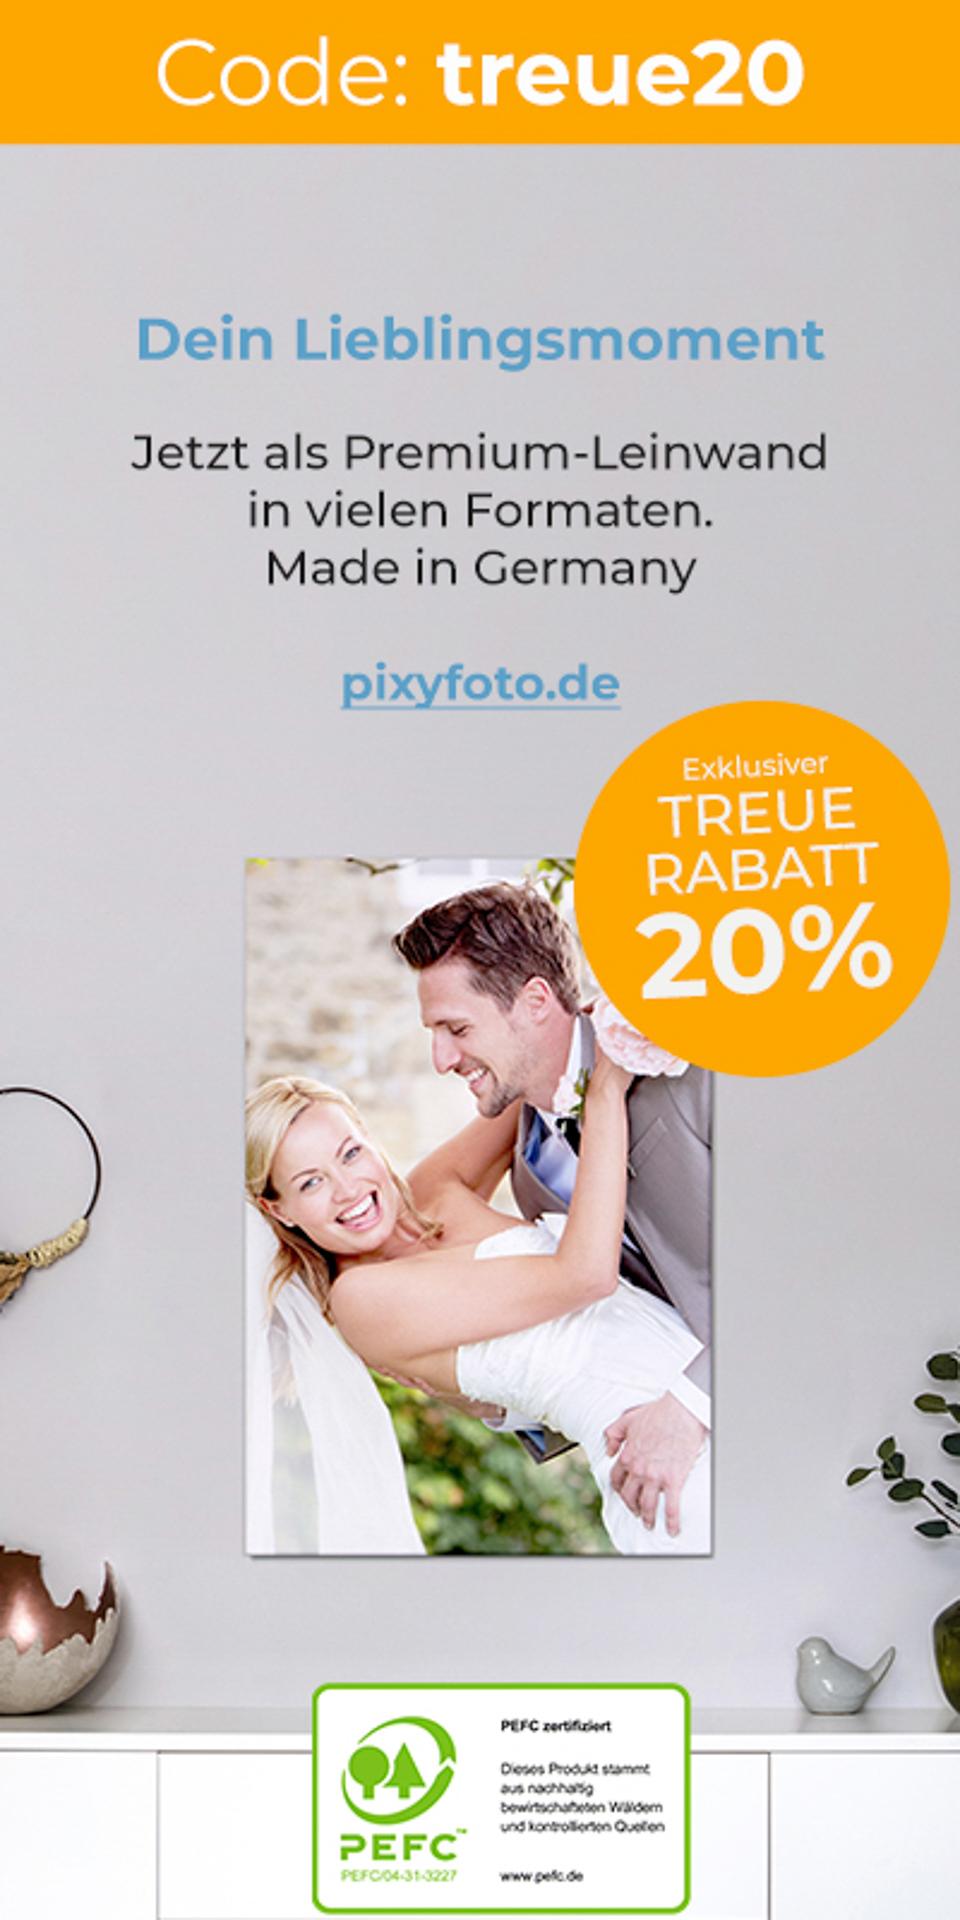 gniced-daniel gross-pfaffenhofen-grafikdesign-digital-assets-posting-14